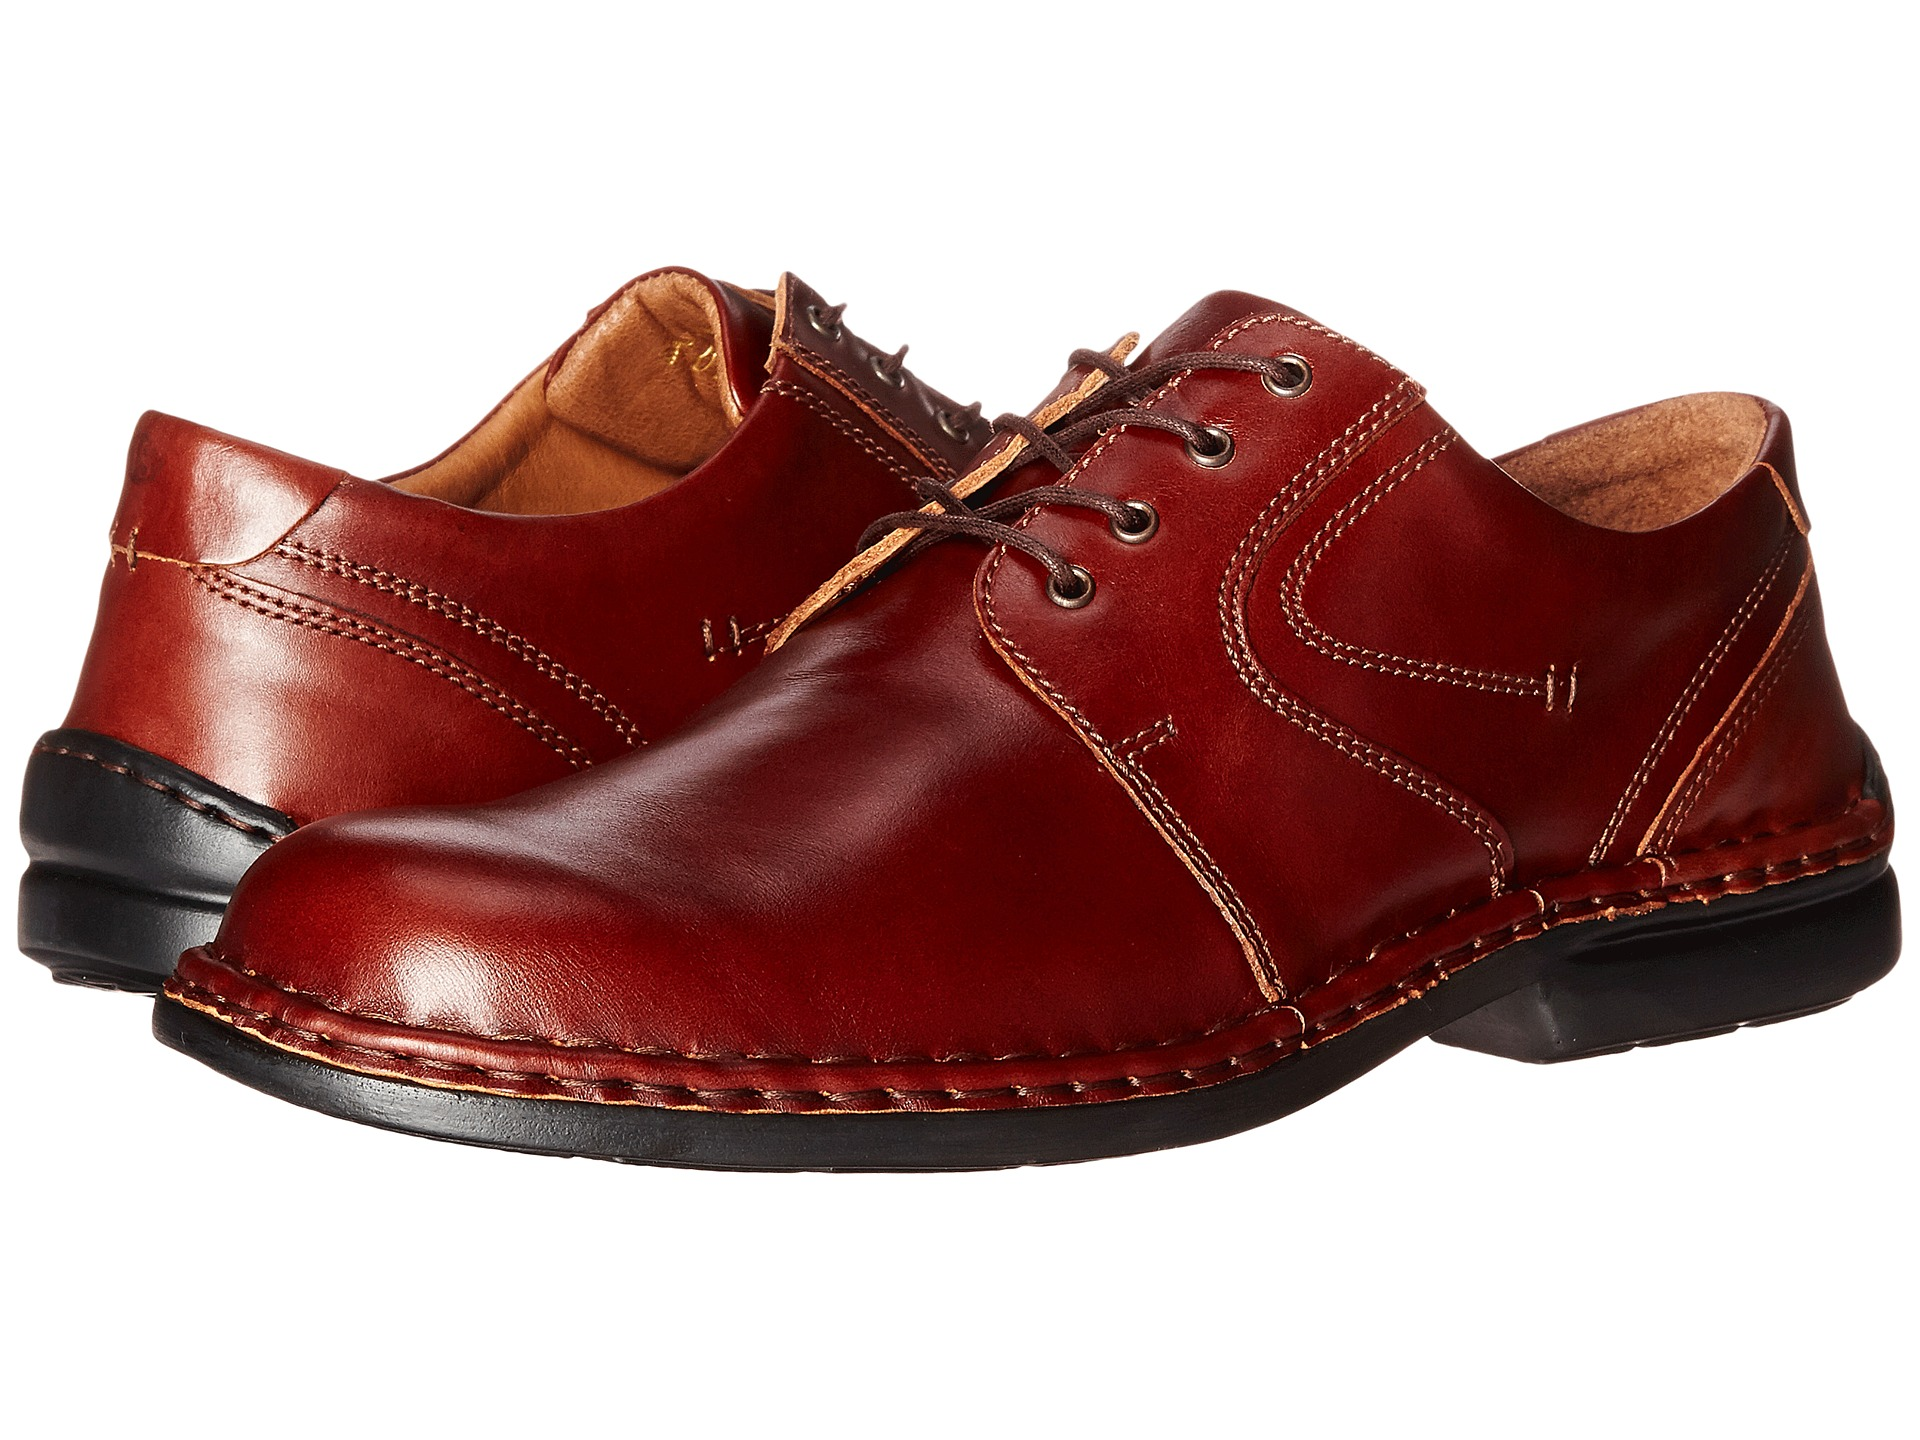 Josef Seibel Shoes Reviews